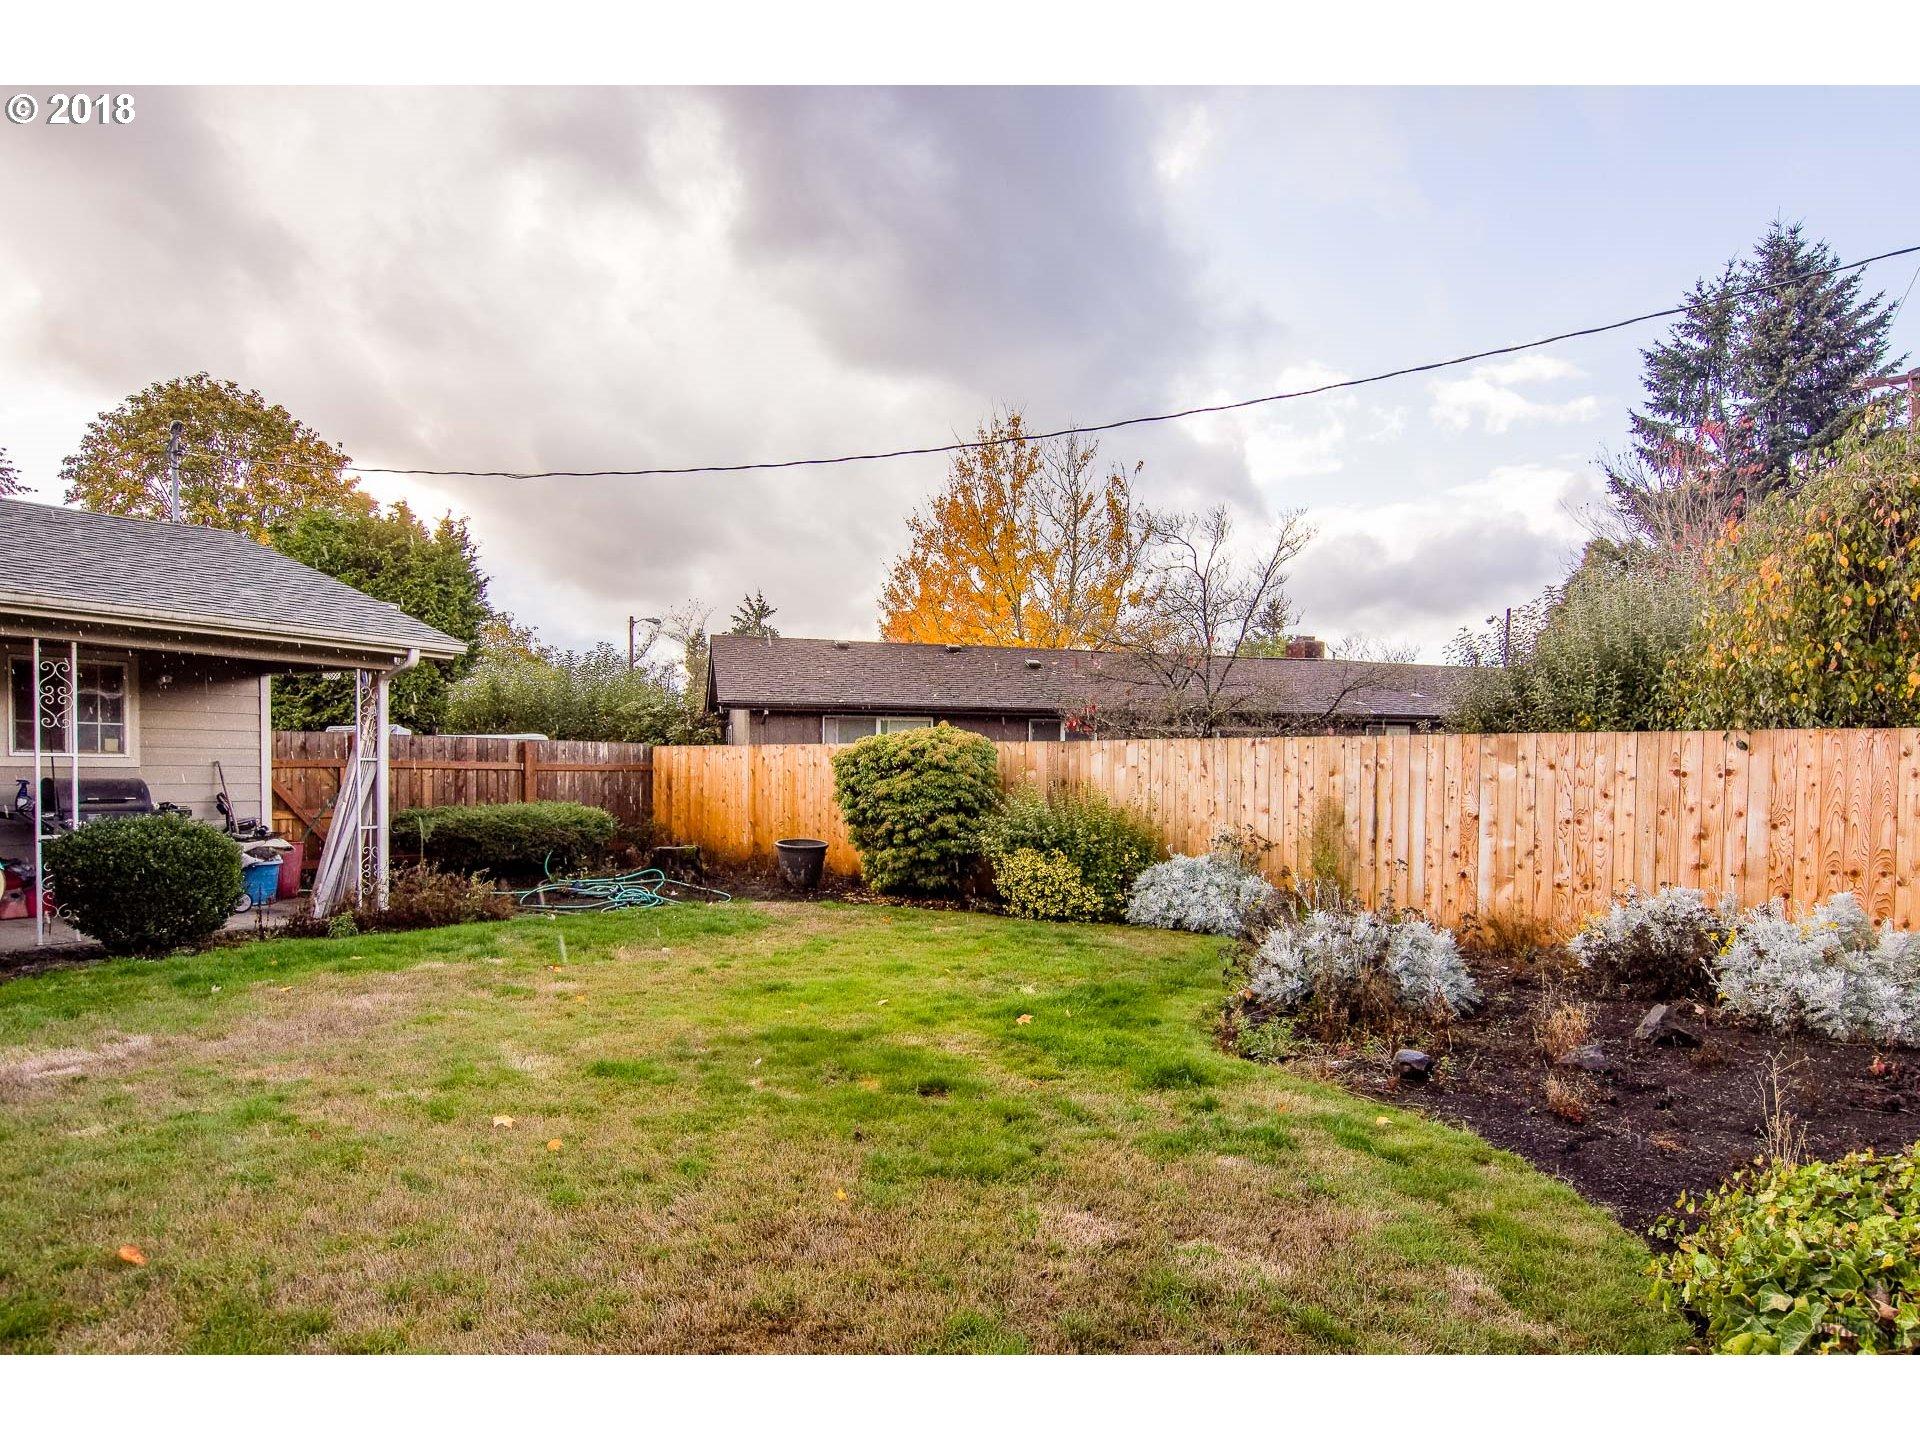 485 DURHAM AVE Eugene, OR 97404 - MLS #: 18063990